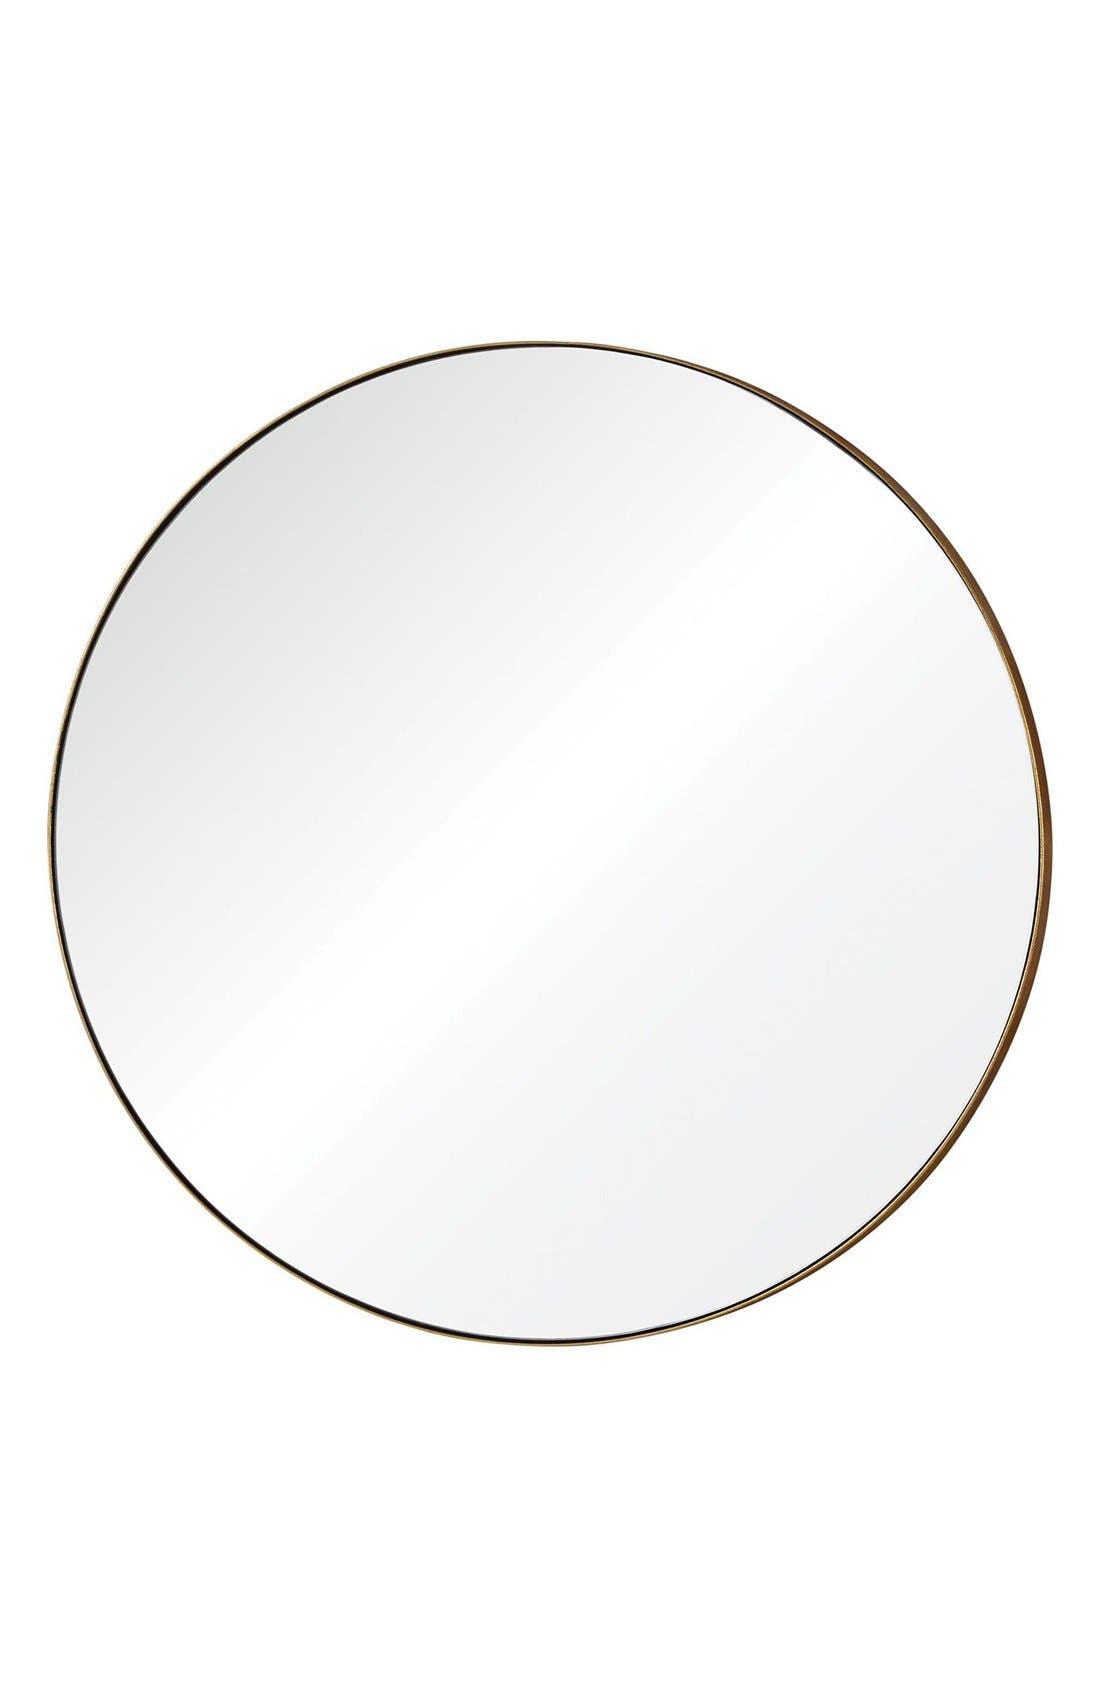 Renwil 'Oryx' Mirror